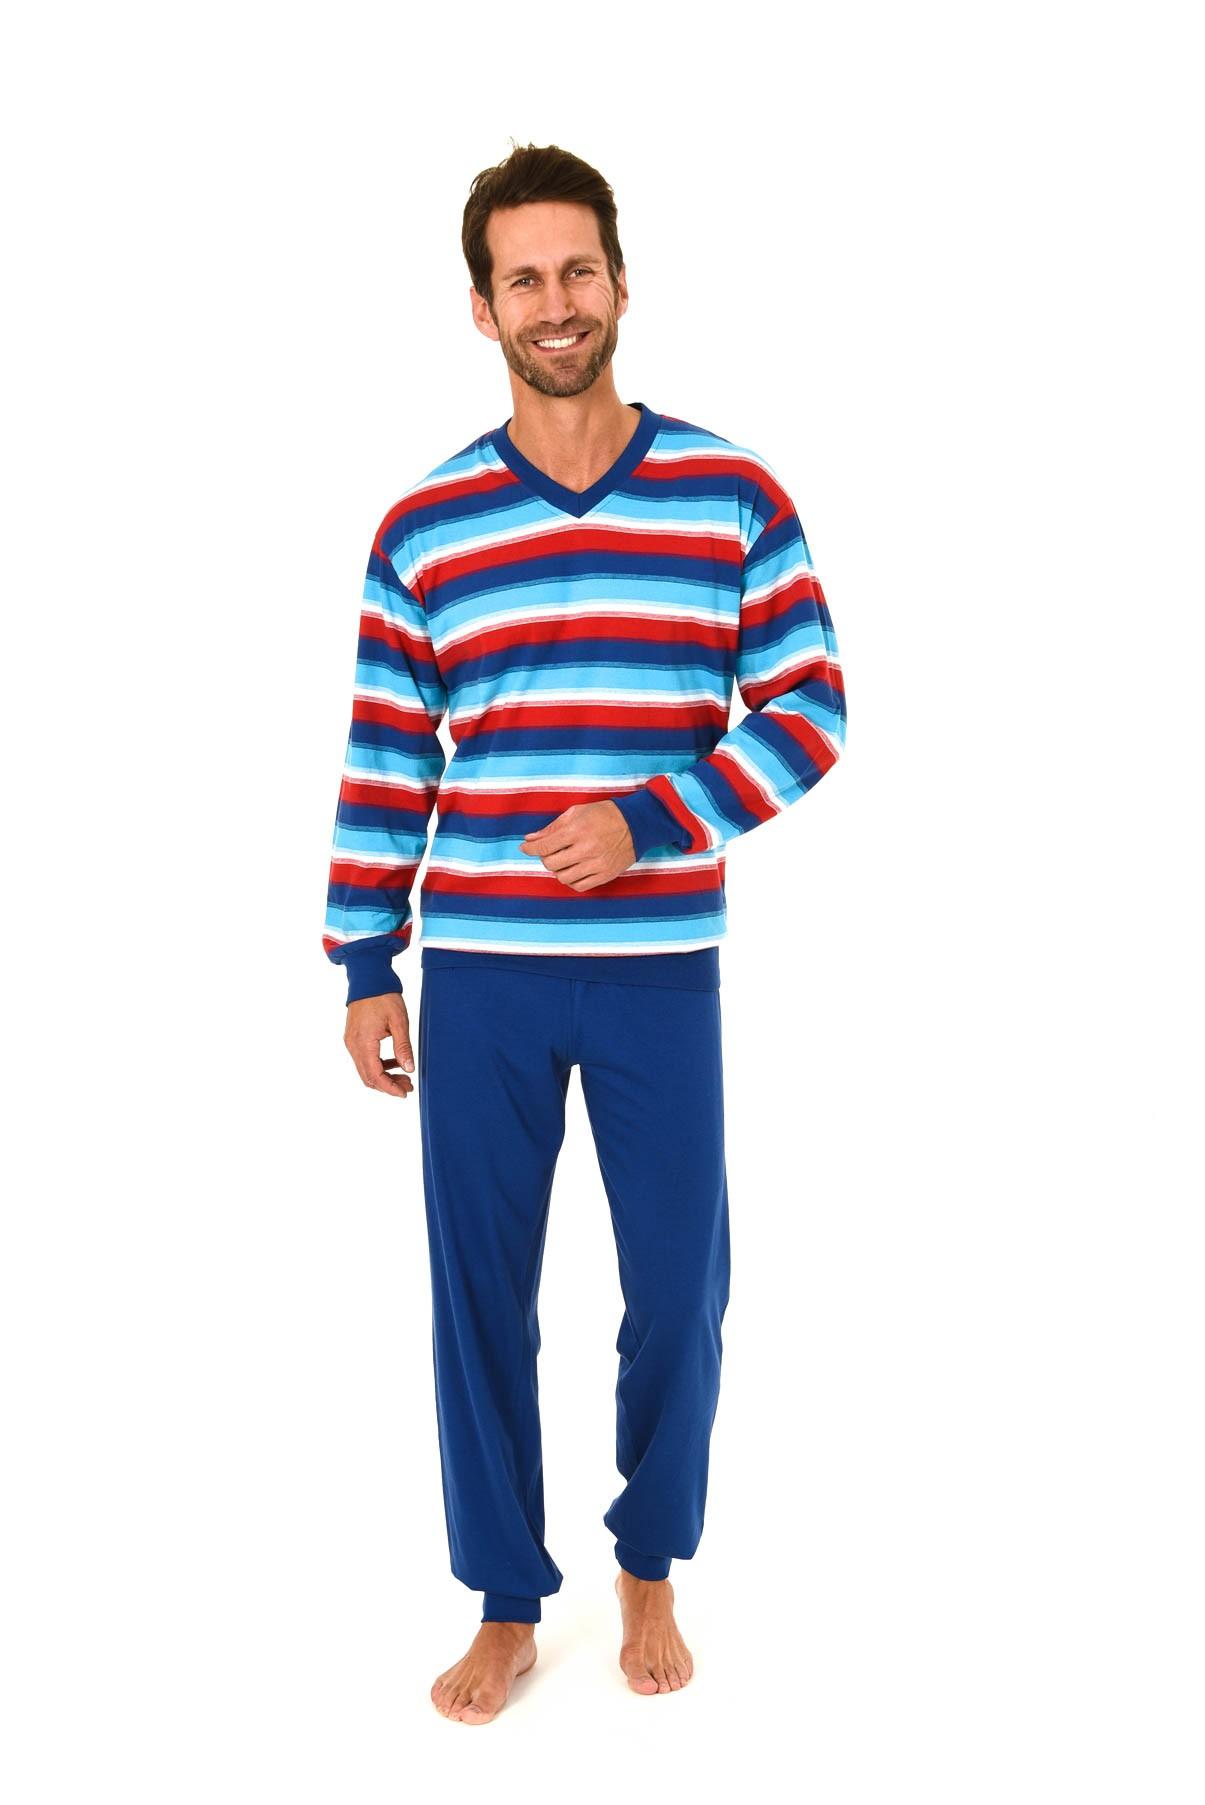 Herren Pyjama langarm mit Bündchen in Streifen Optik – 58477